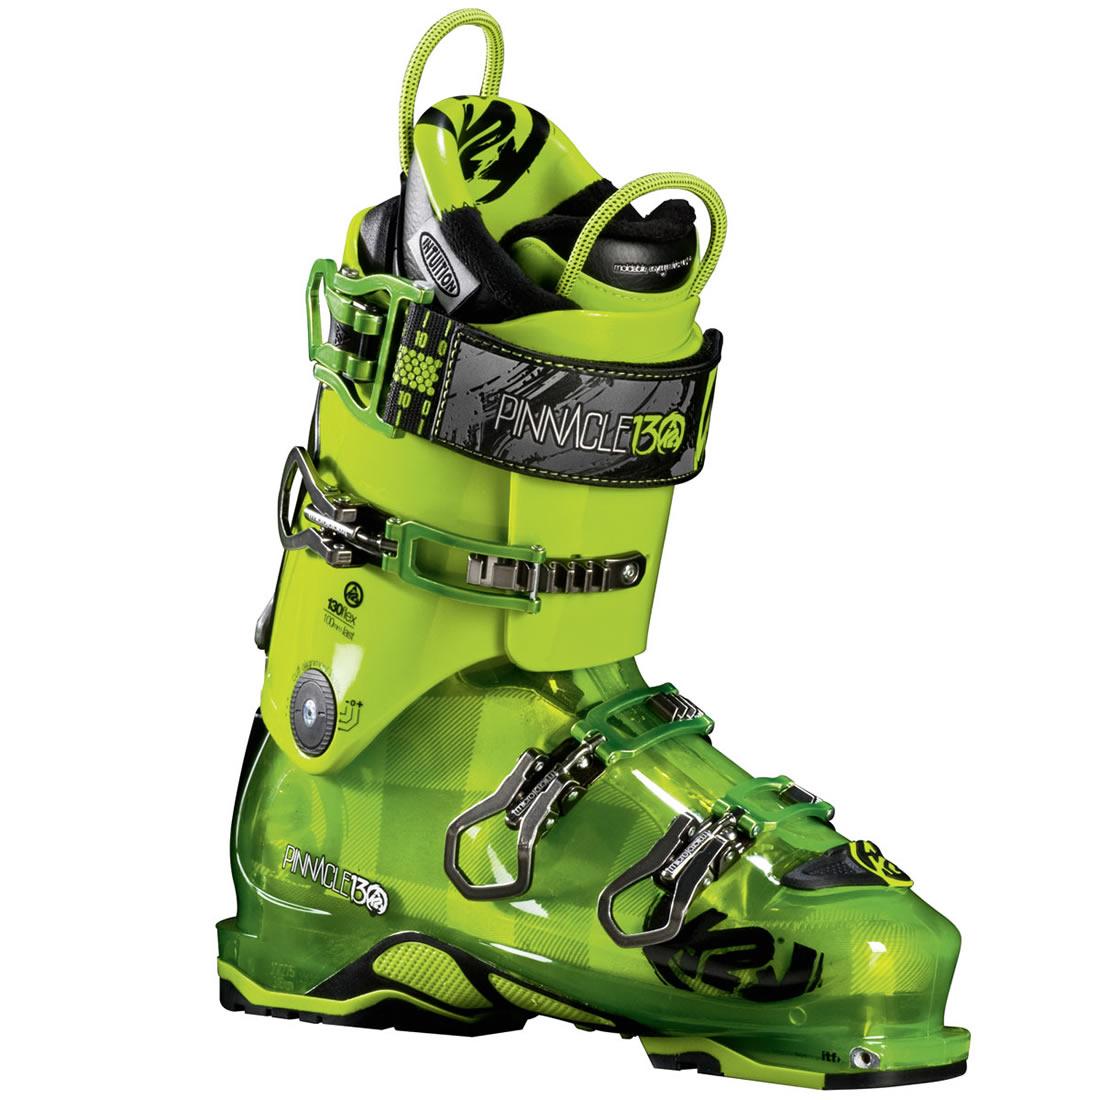 Chaussure K2 Pinnacle 130 2013, 2014